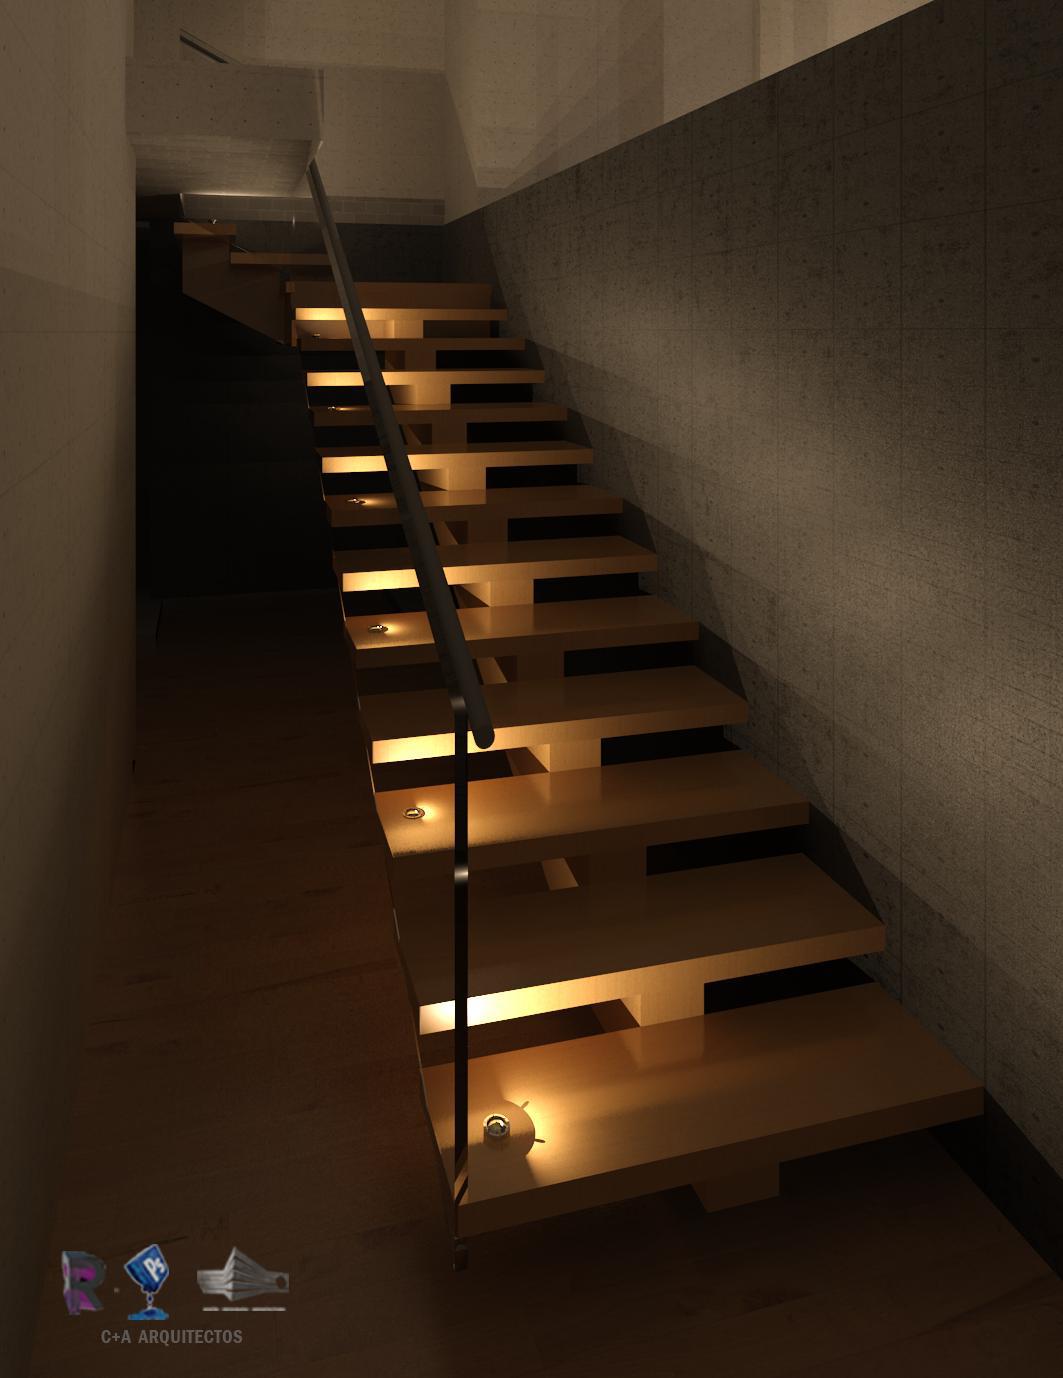 C a arquitectos dise o infografia arquitectura renders - Iluminacion de escaleras ...